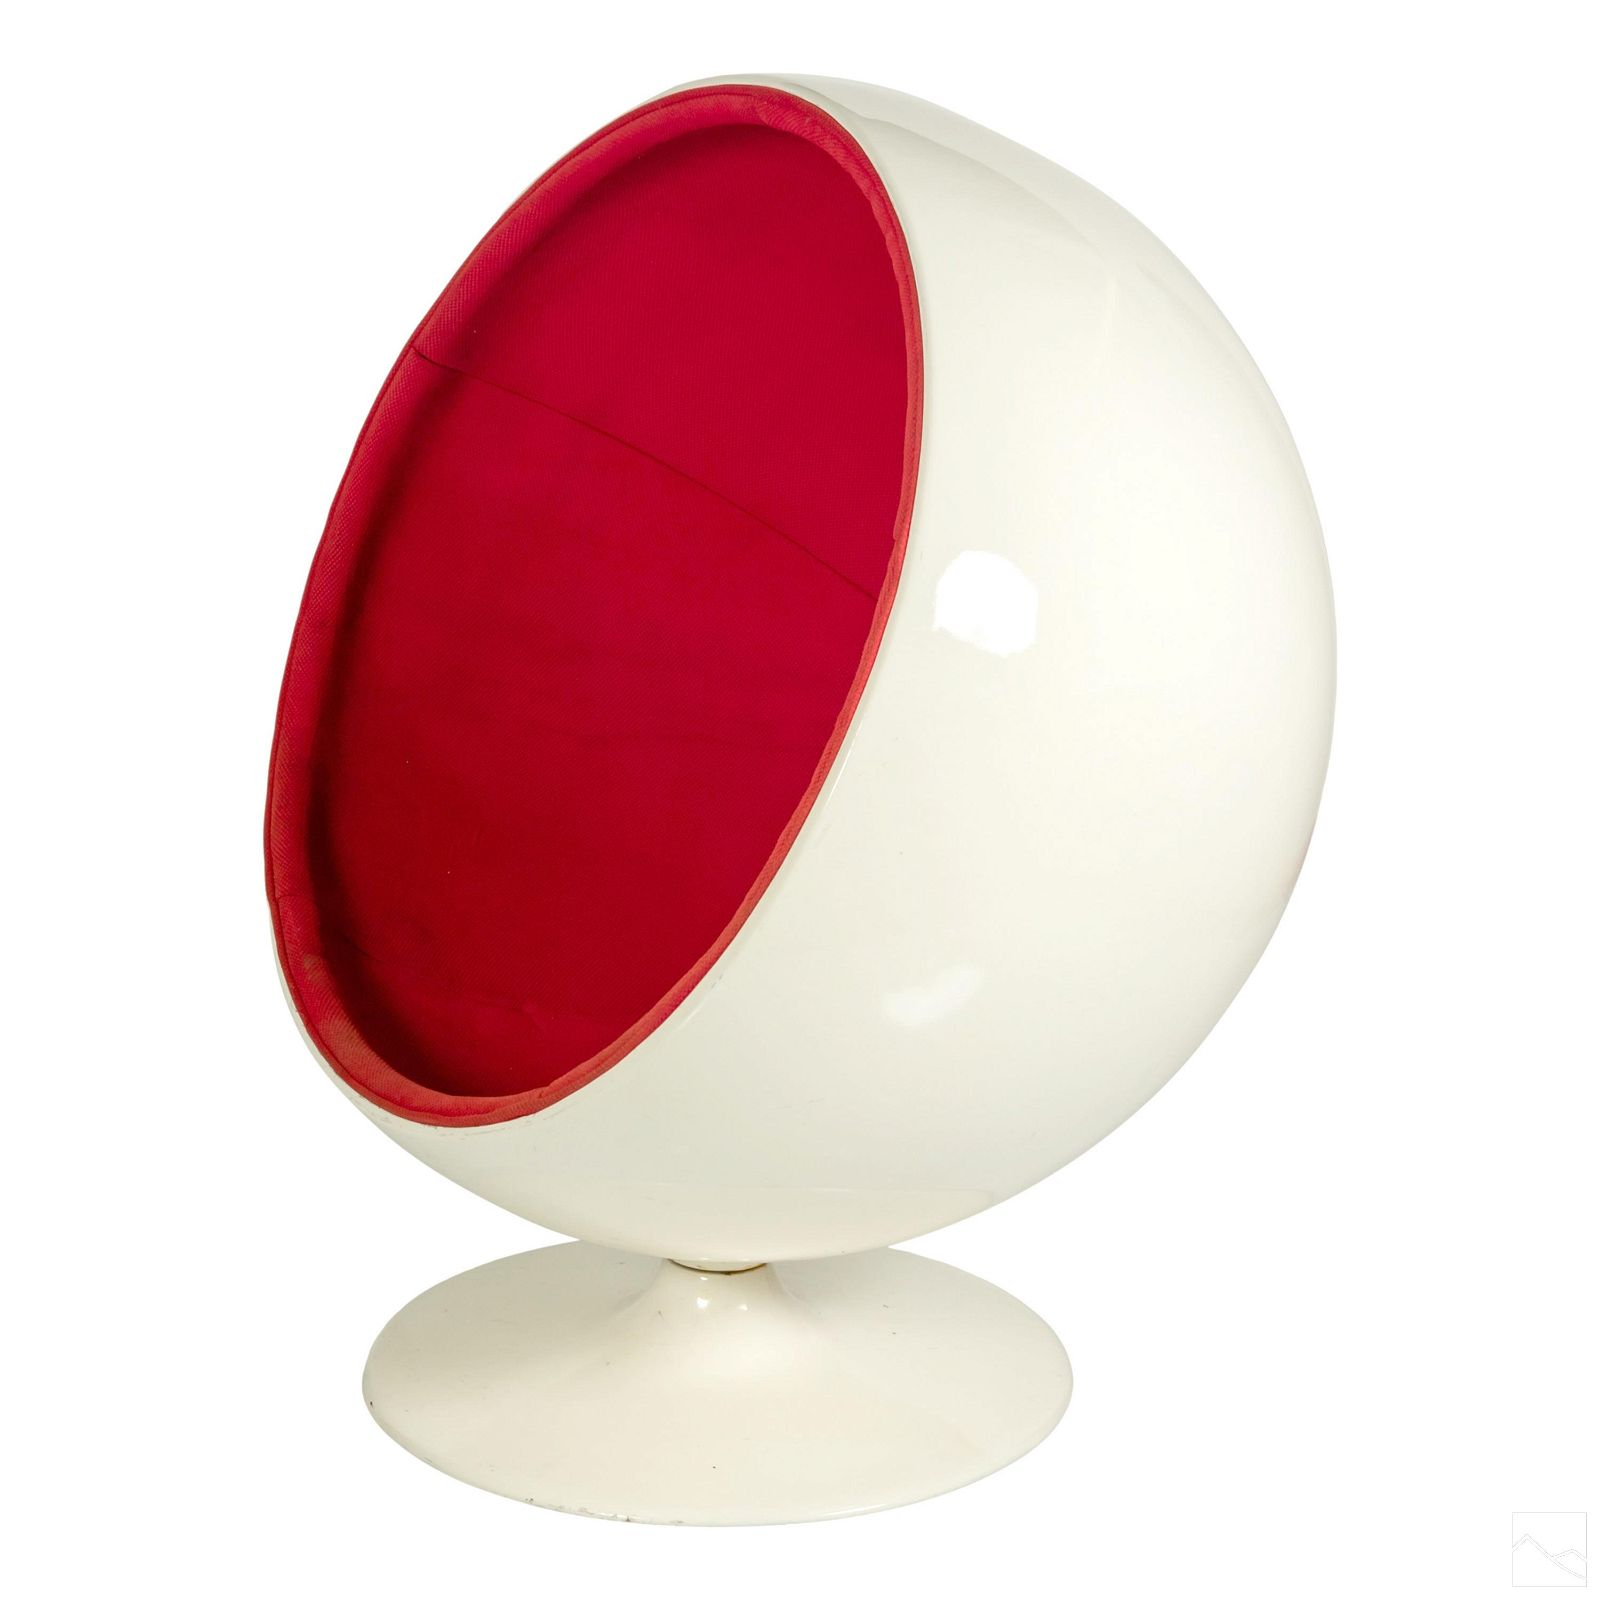 Modern Lounge Ball Chair Designed by Eero Aarnio